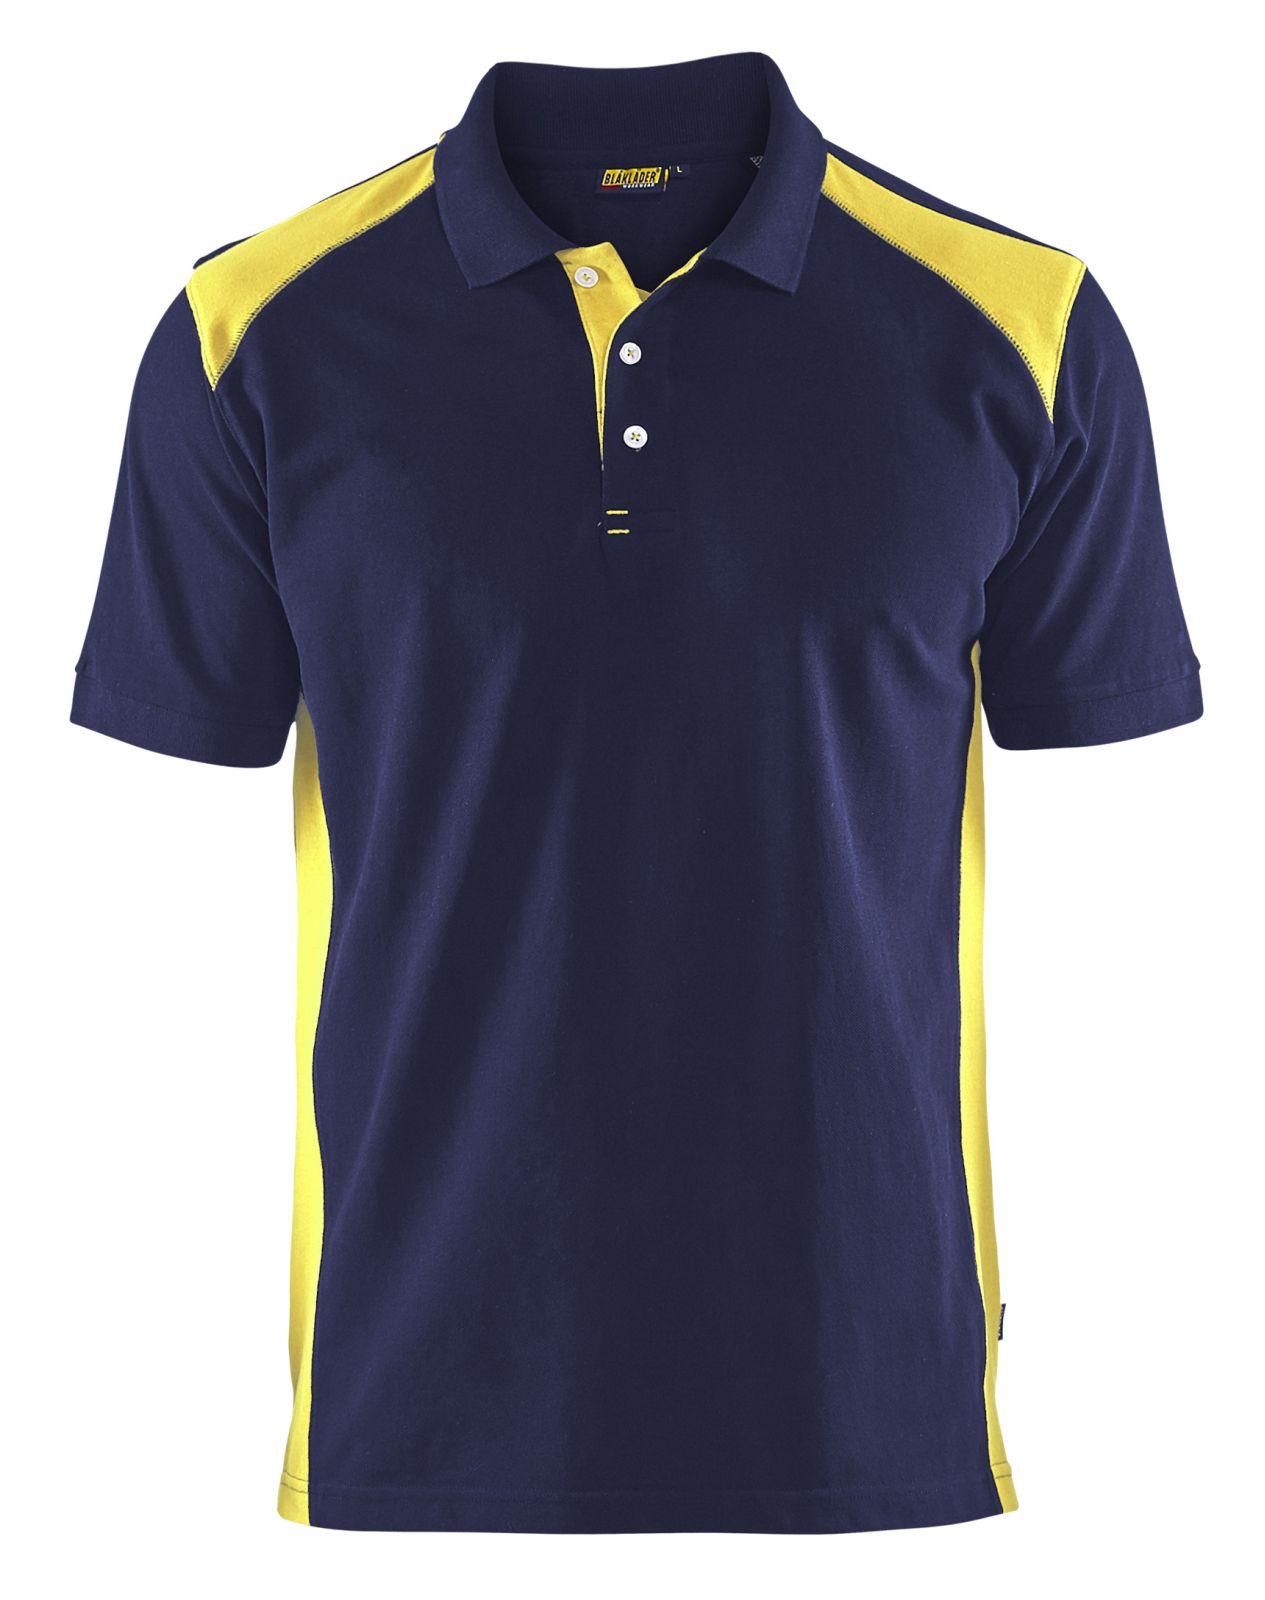 Blaklader Polo shirts 33241050 marineblauw-geel(8933)